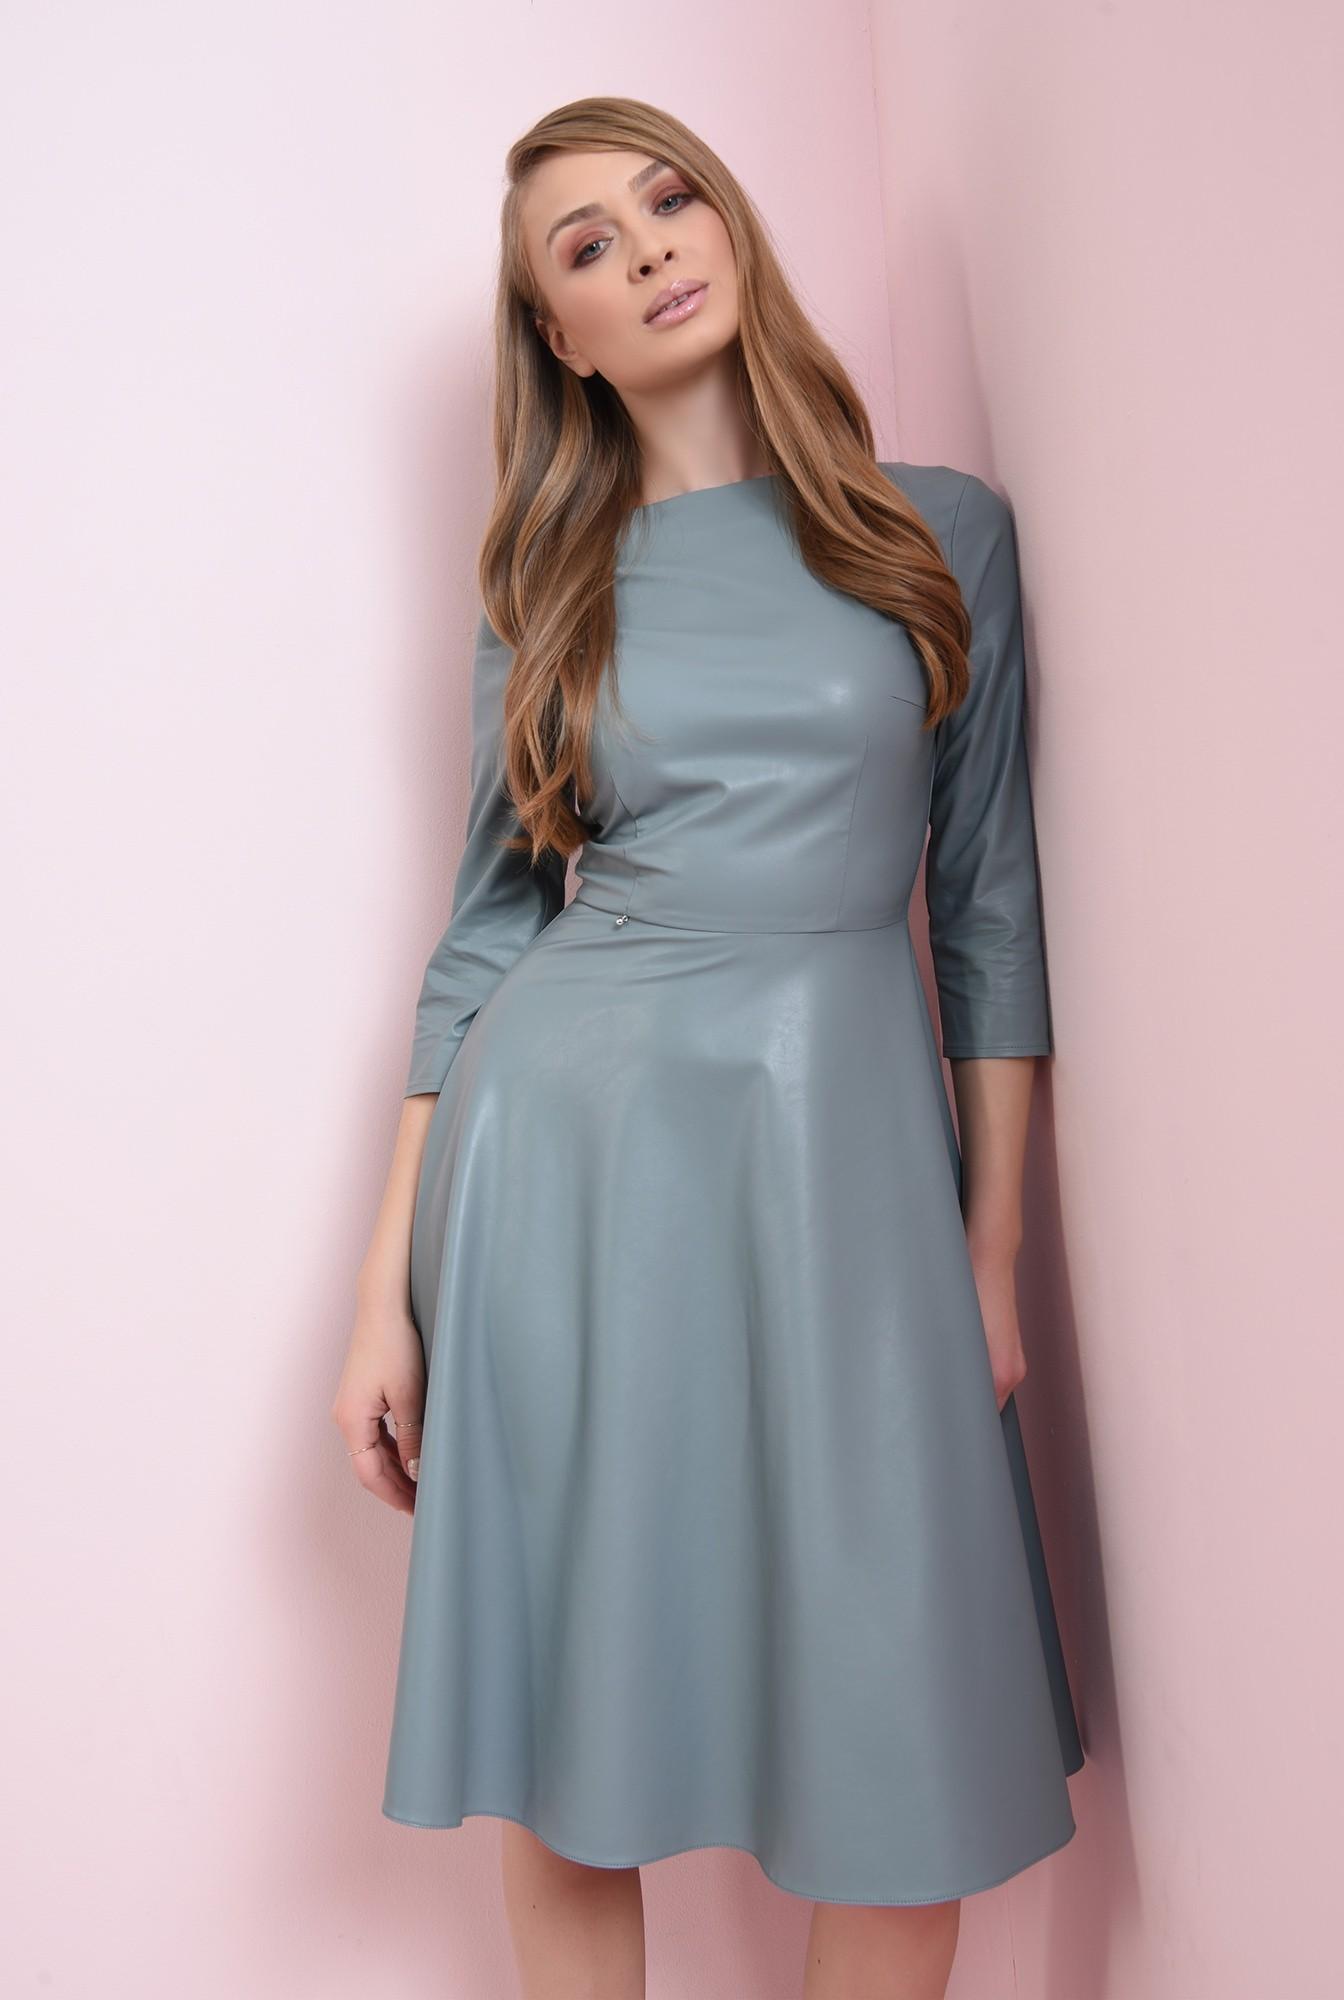 1 - rochie casual, albastra, cu maneca 3/4